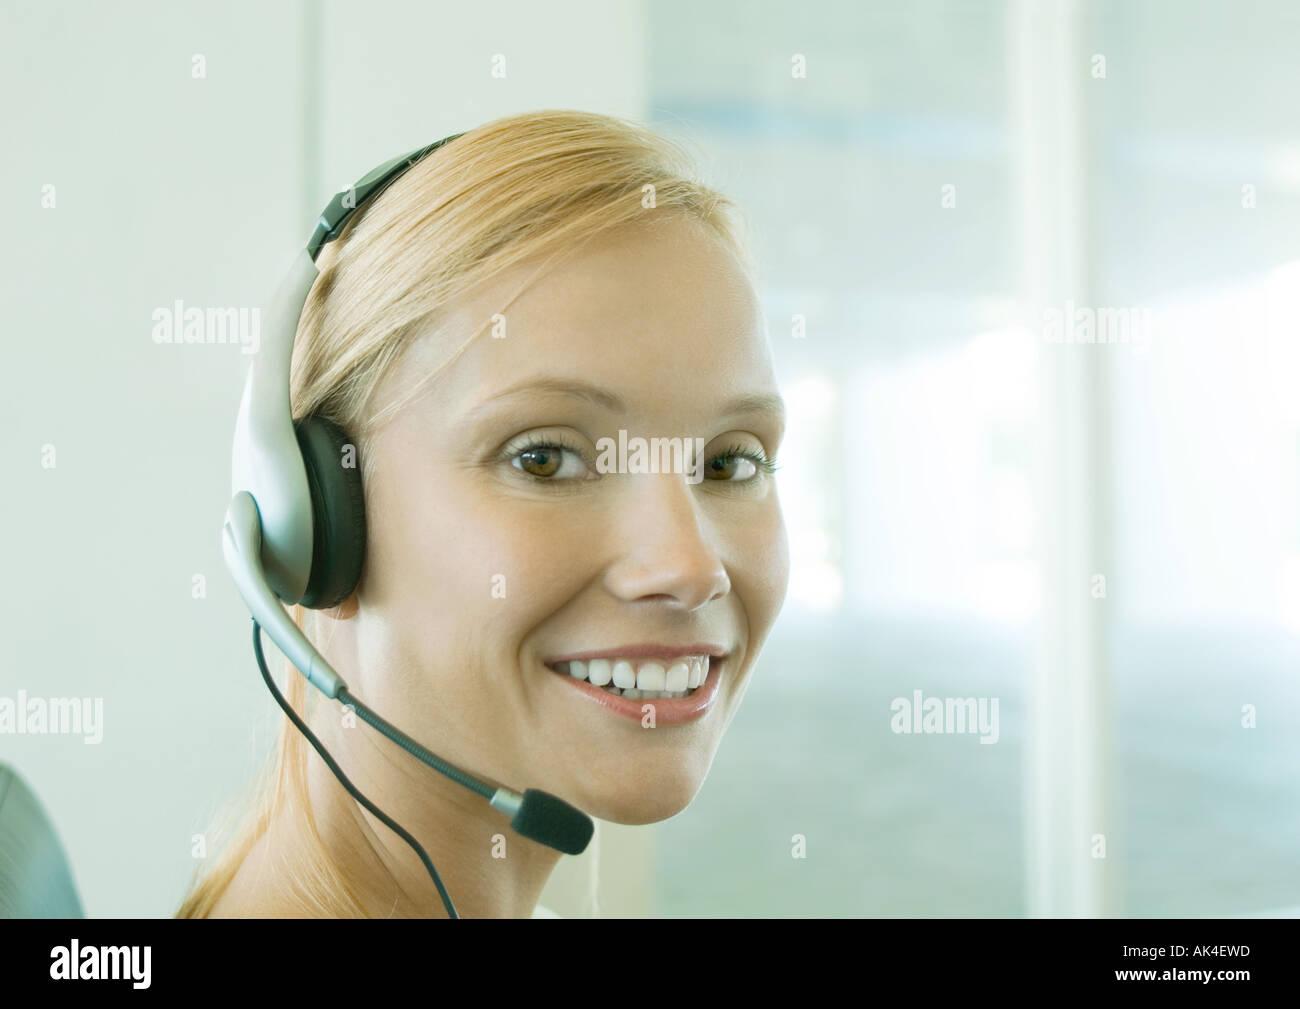 Woman wearing headset - Stock Image